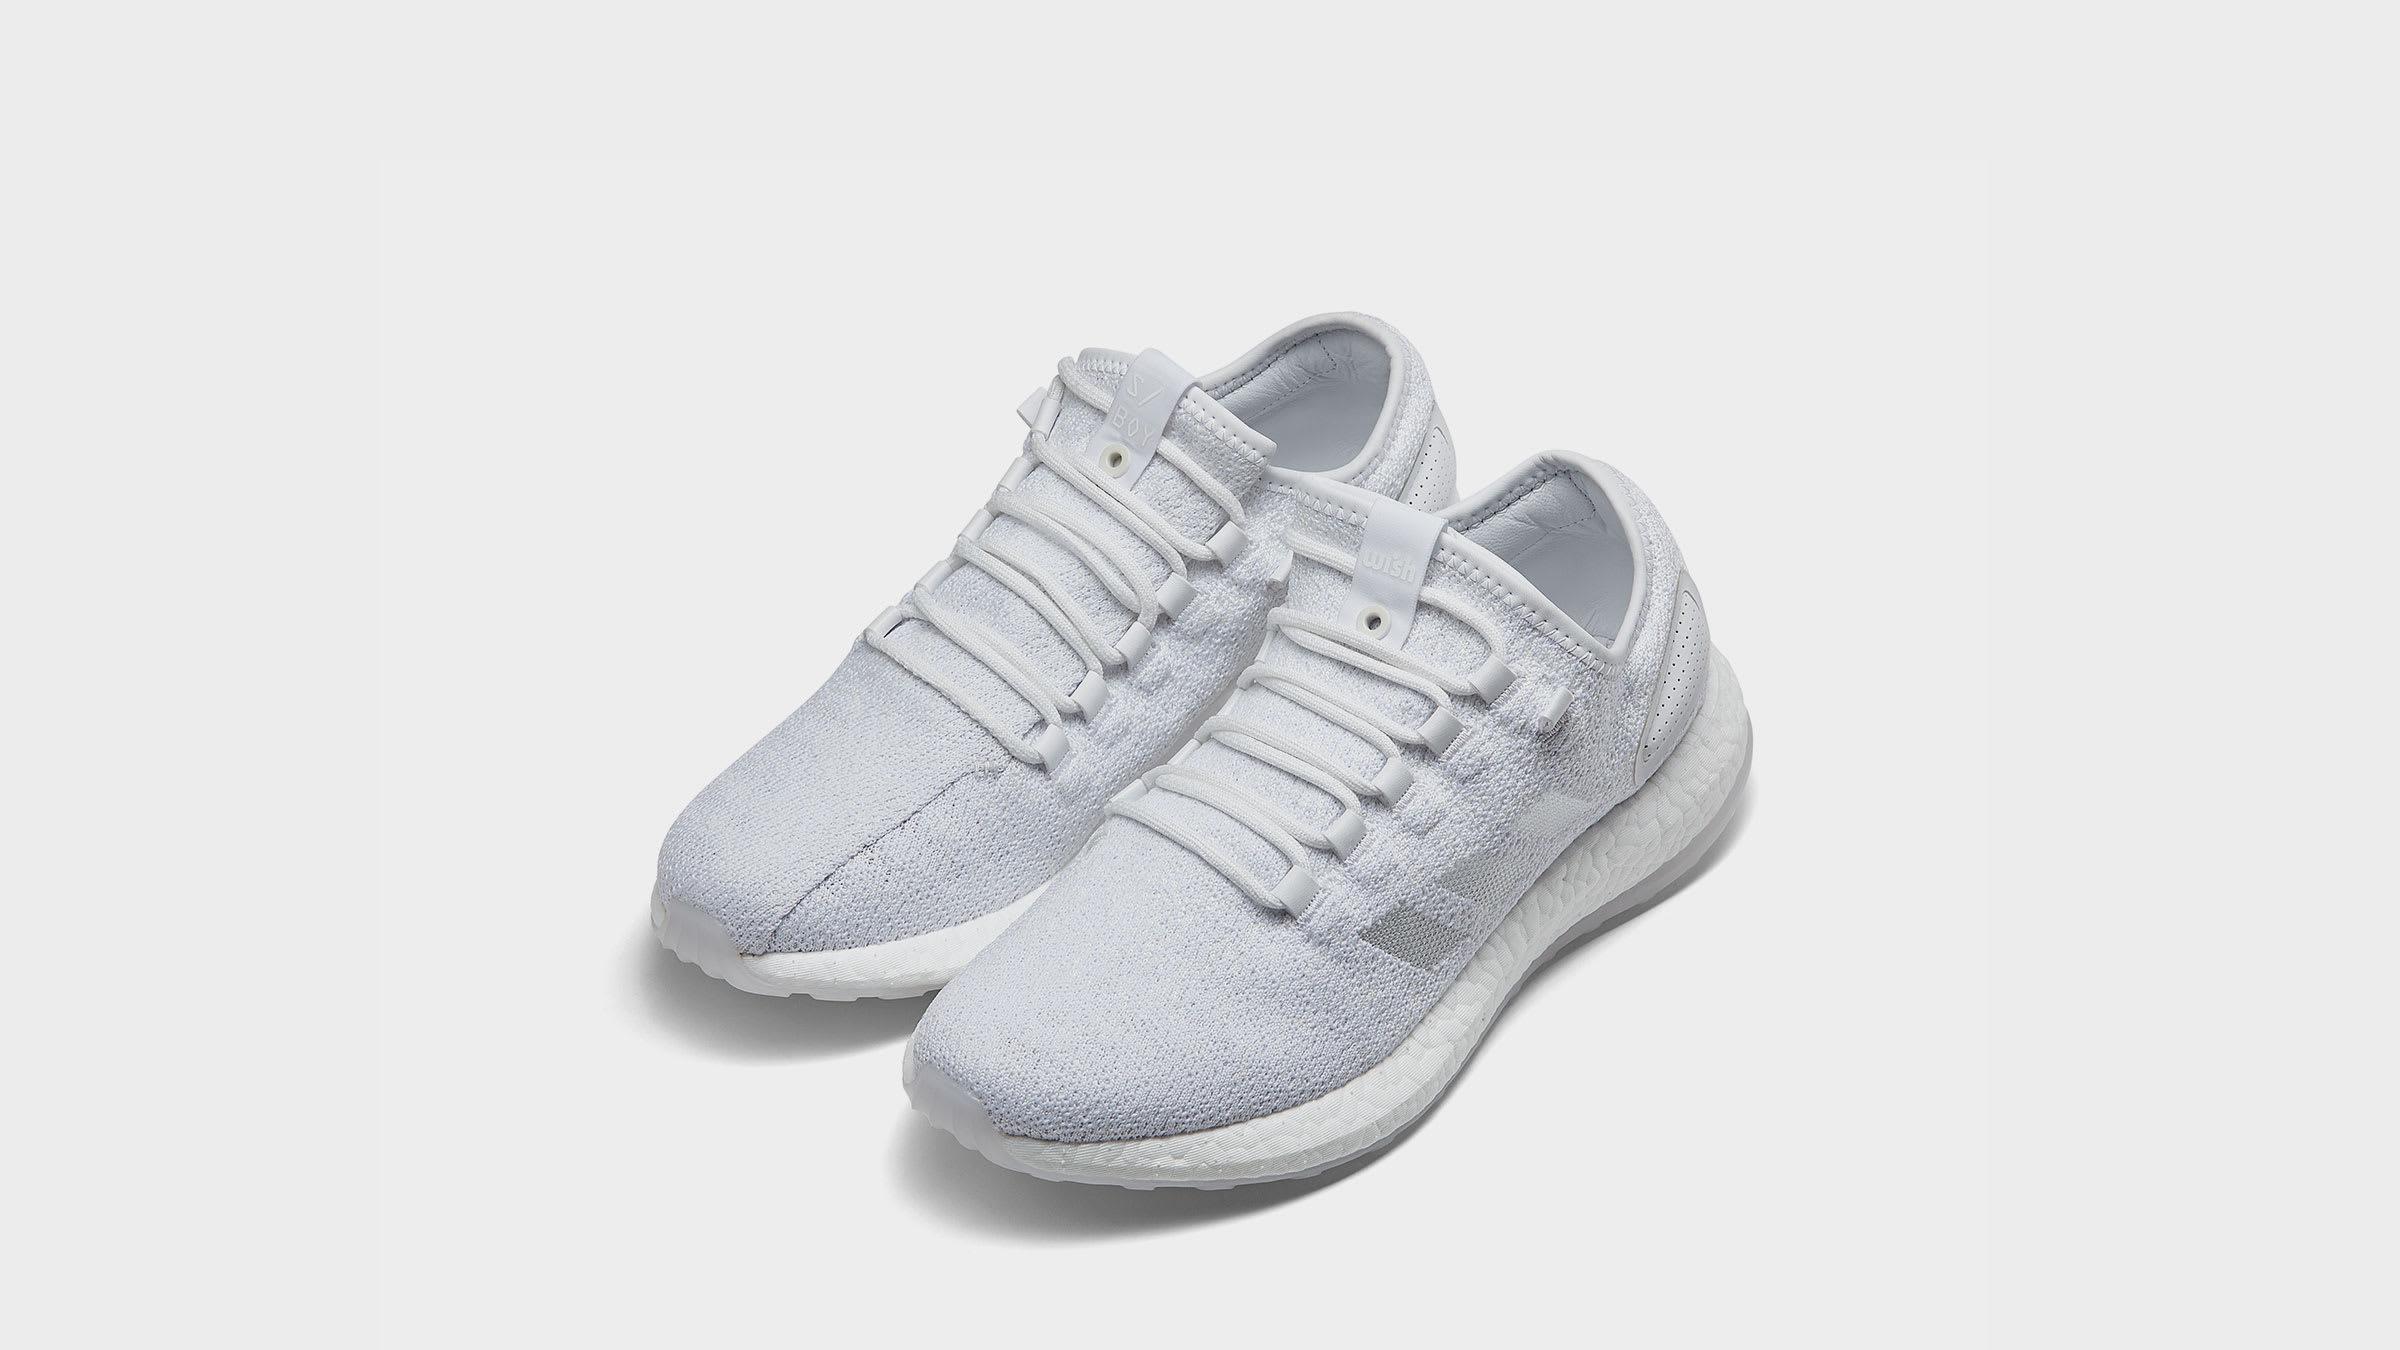 c515a216d Adidas x Sneaker Boy x Wish PureBoost White